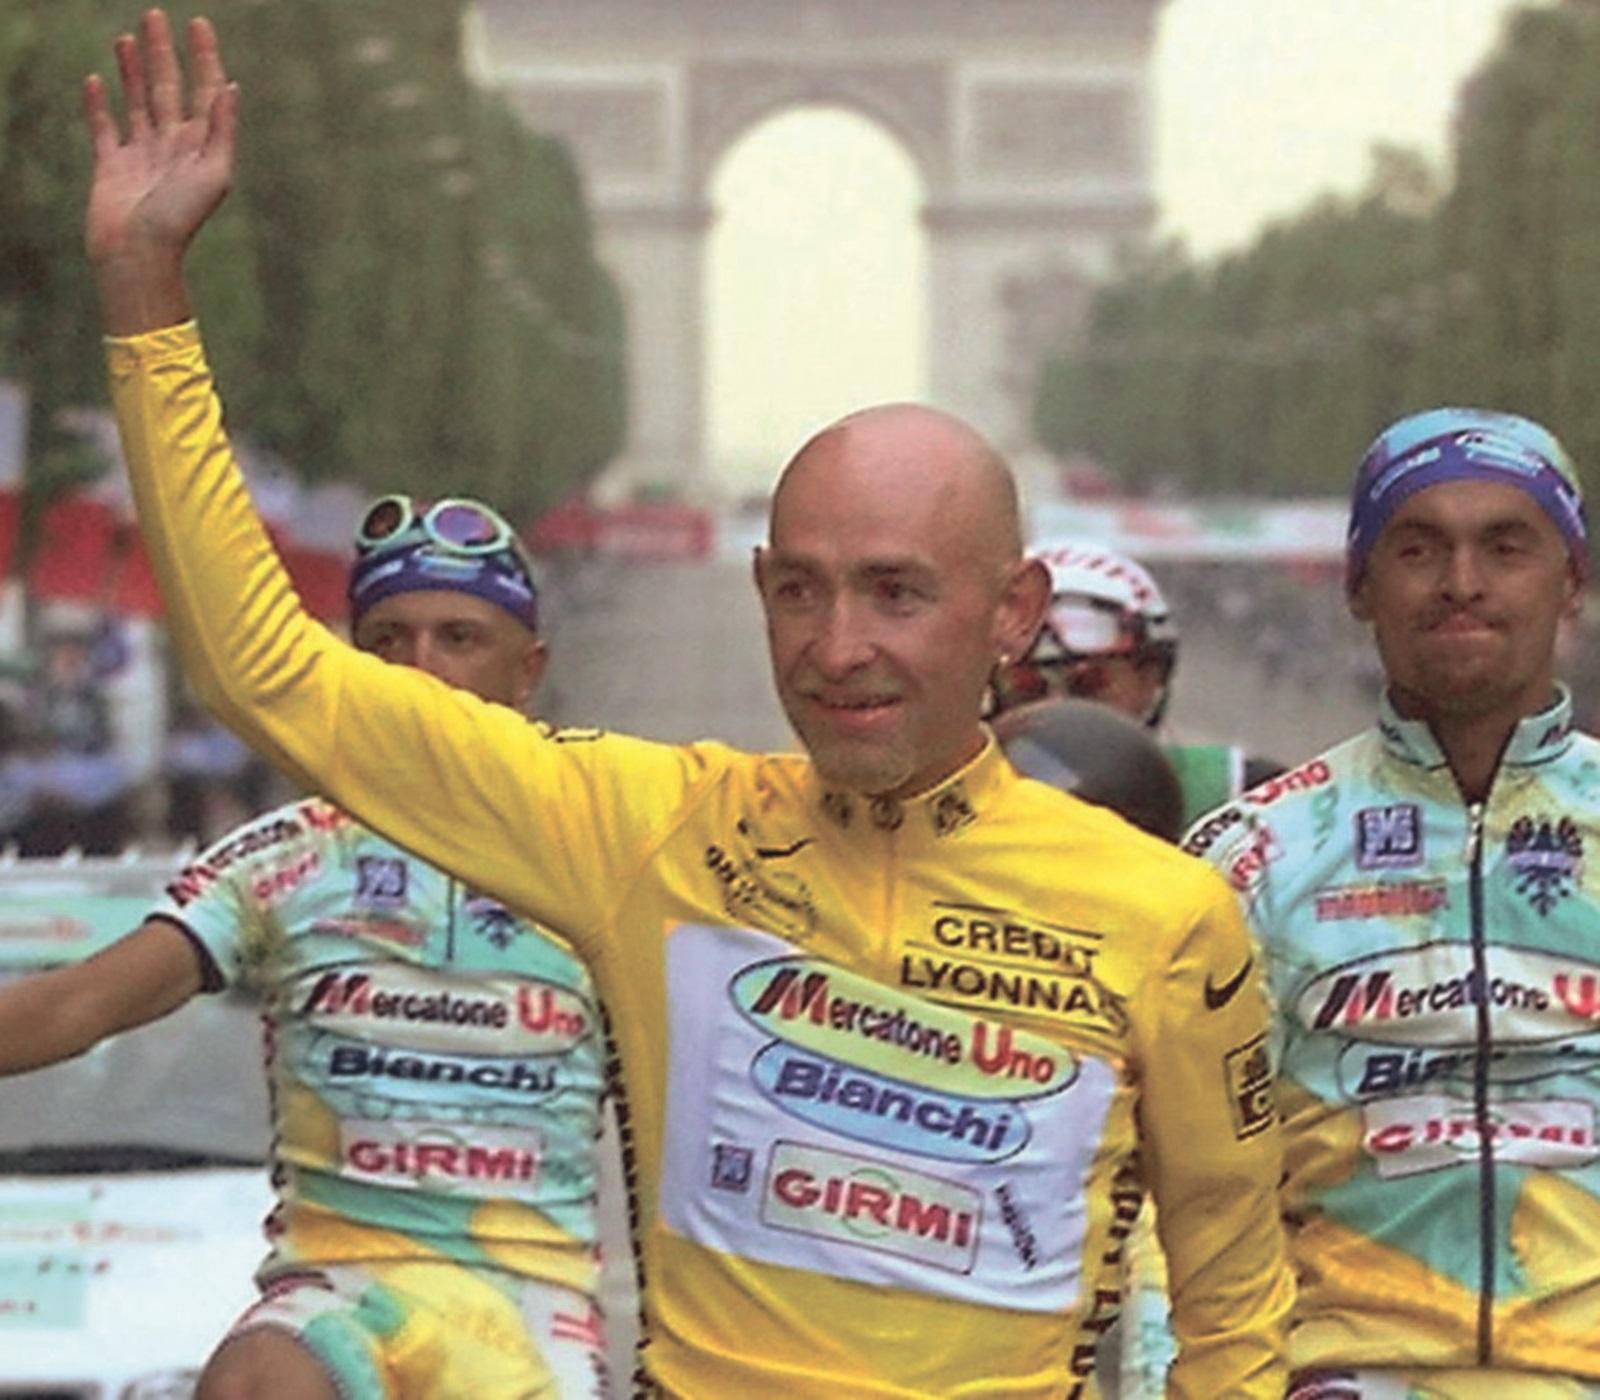 Modena celebra Pantani e l'accoppiata Giro-Tour col papà del campione